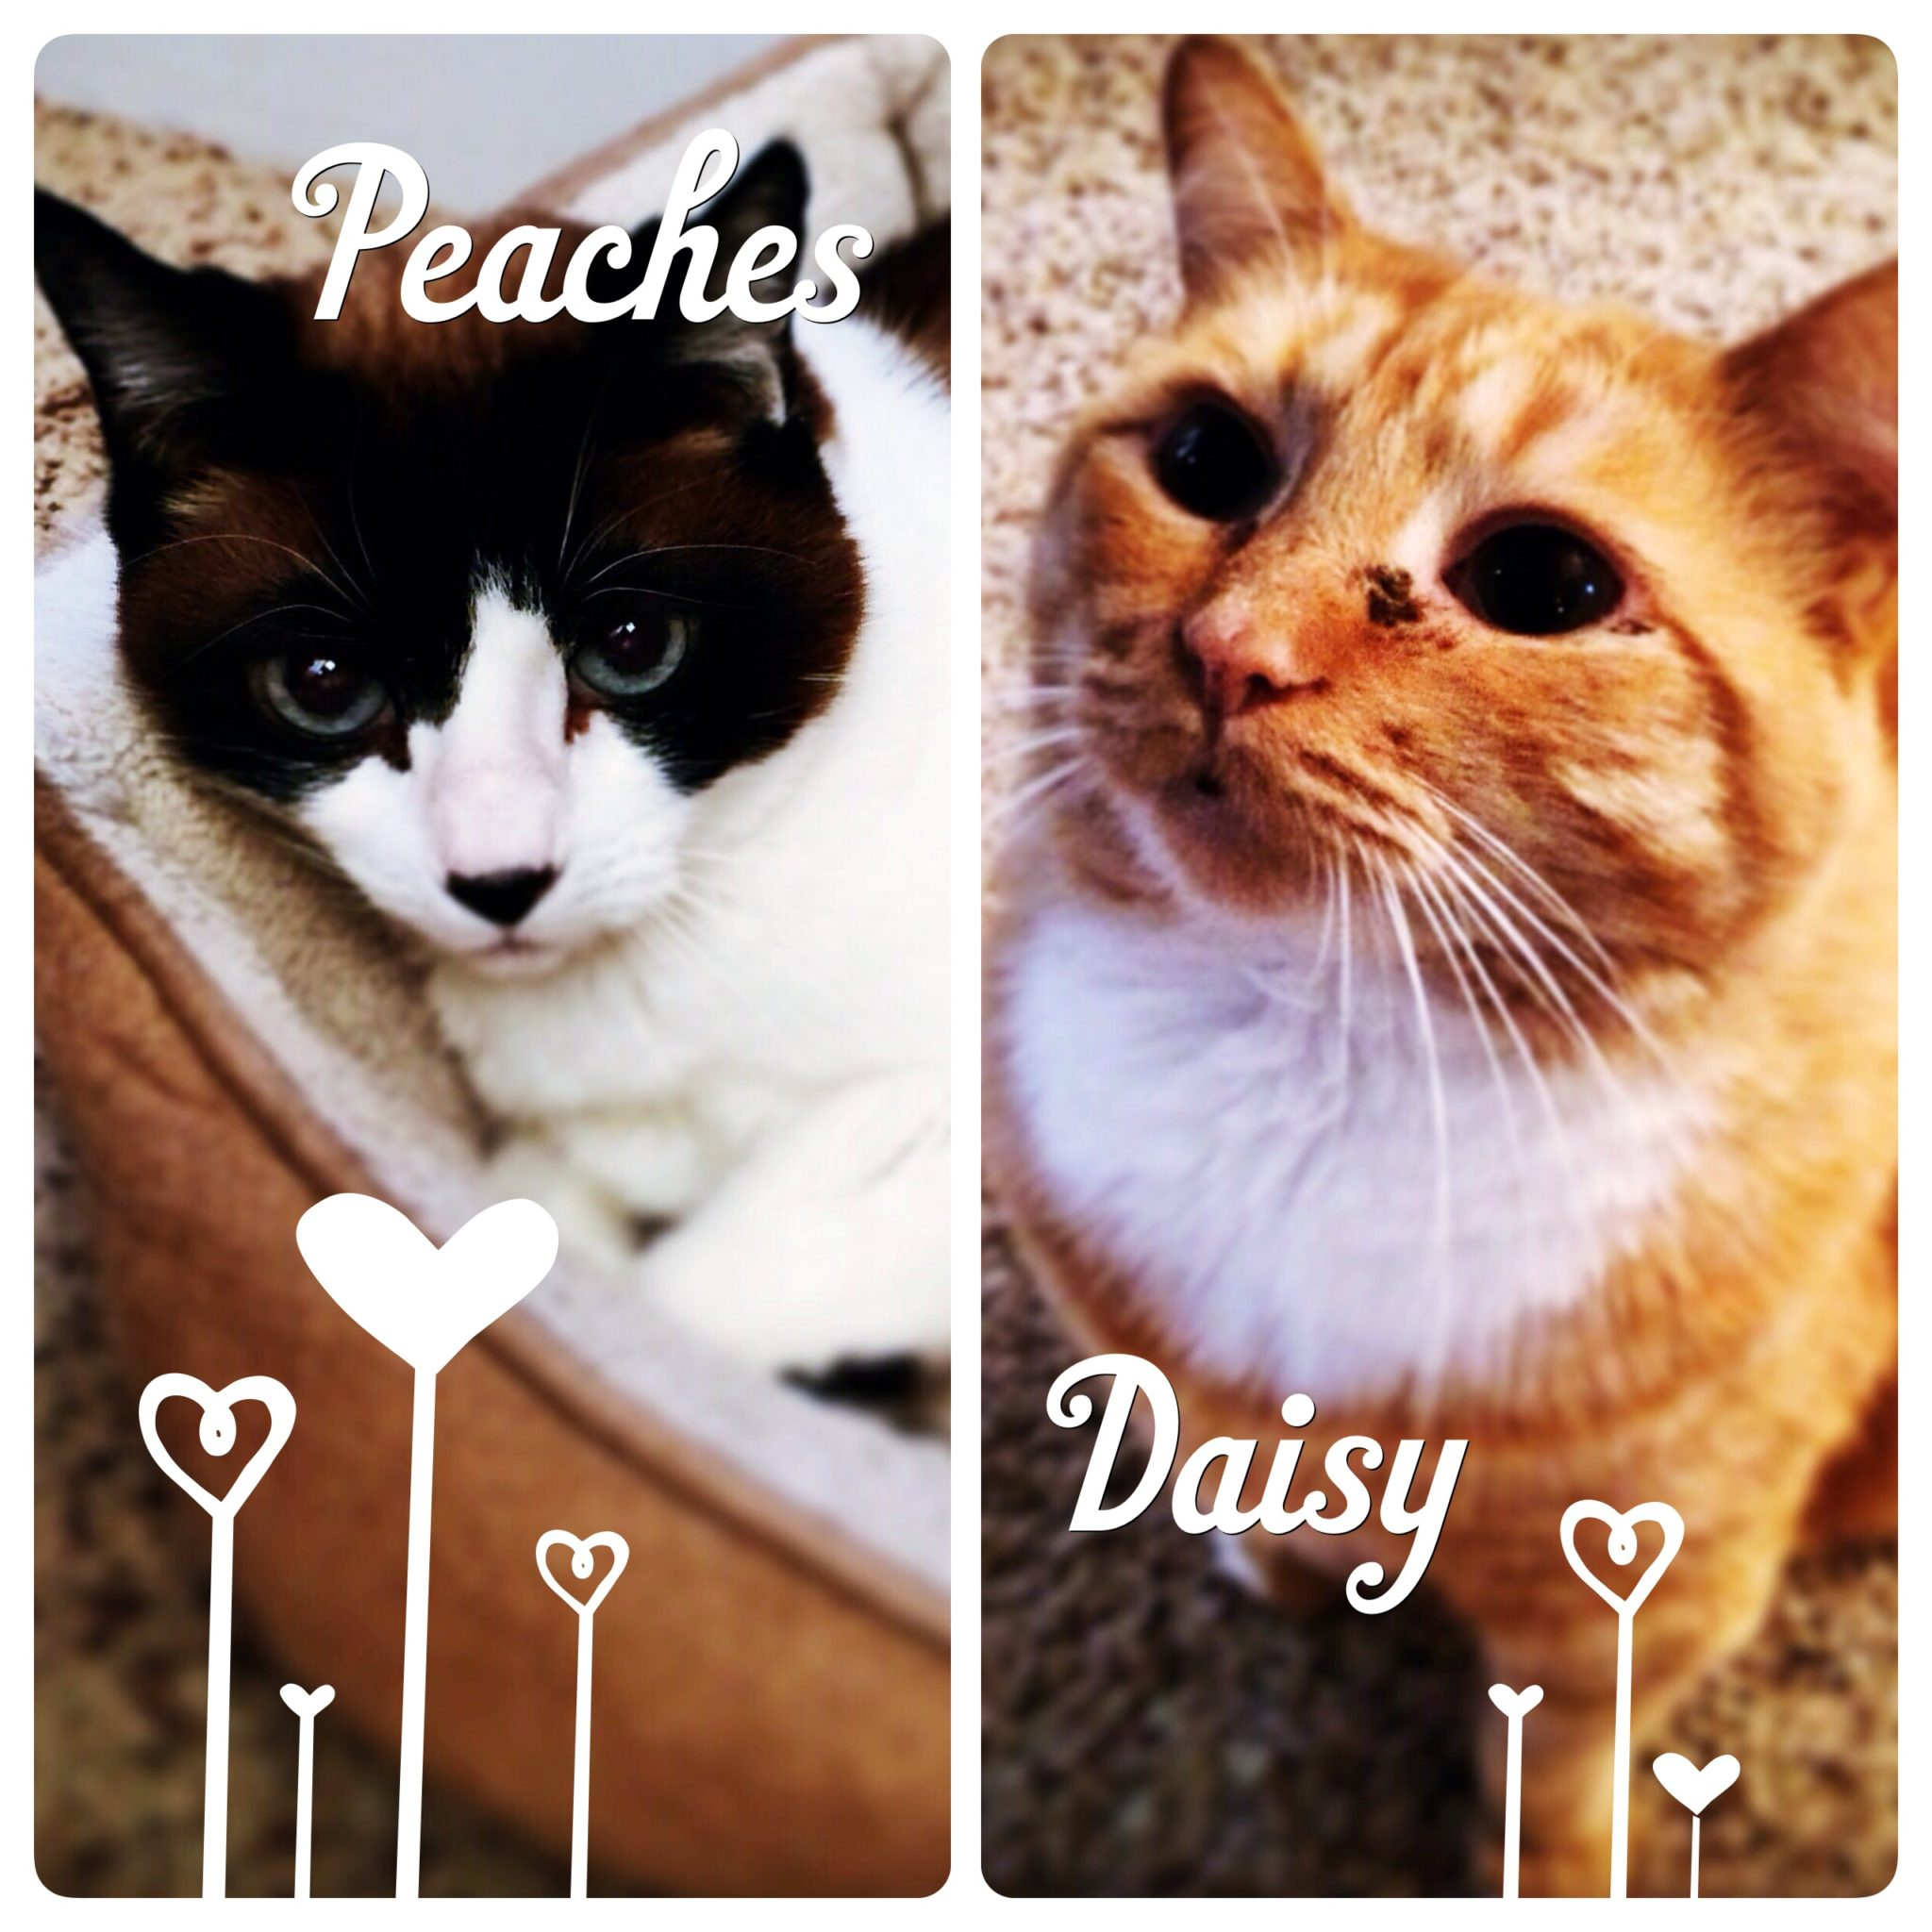 Daisy-Peaches-Testimonial